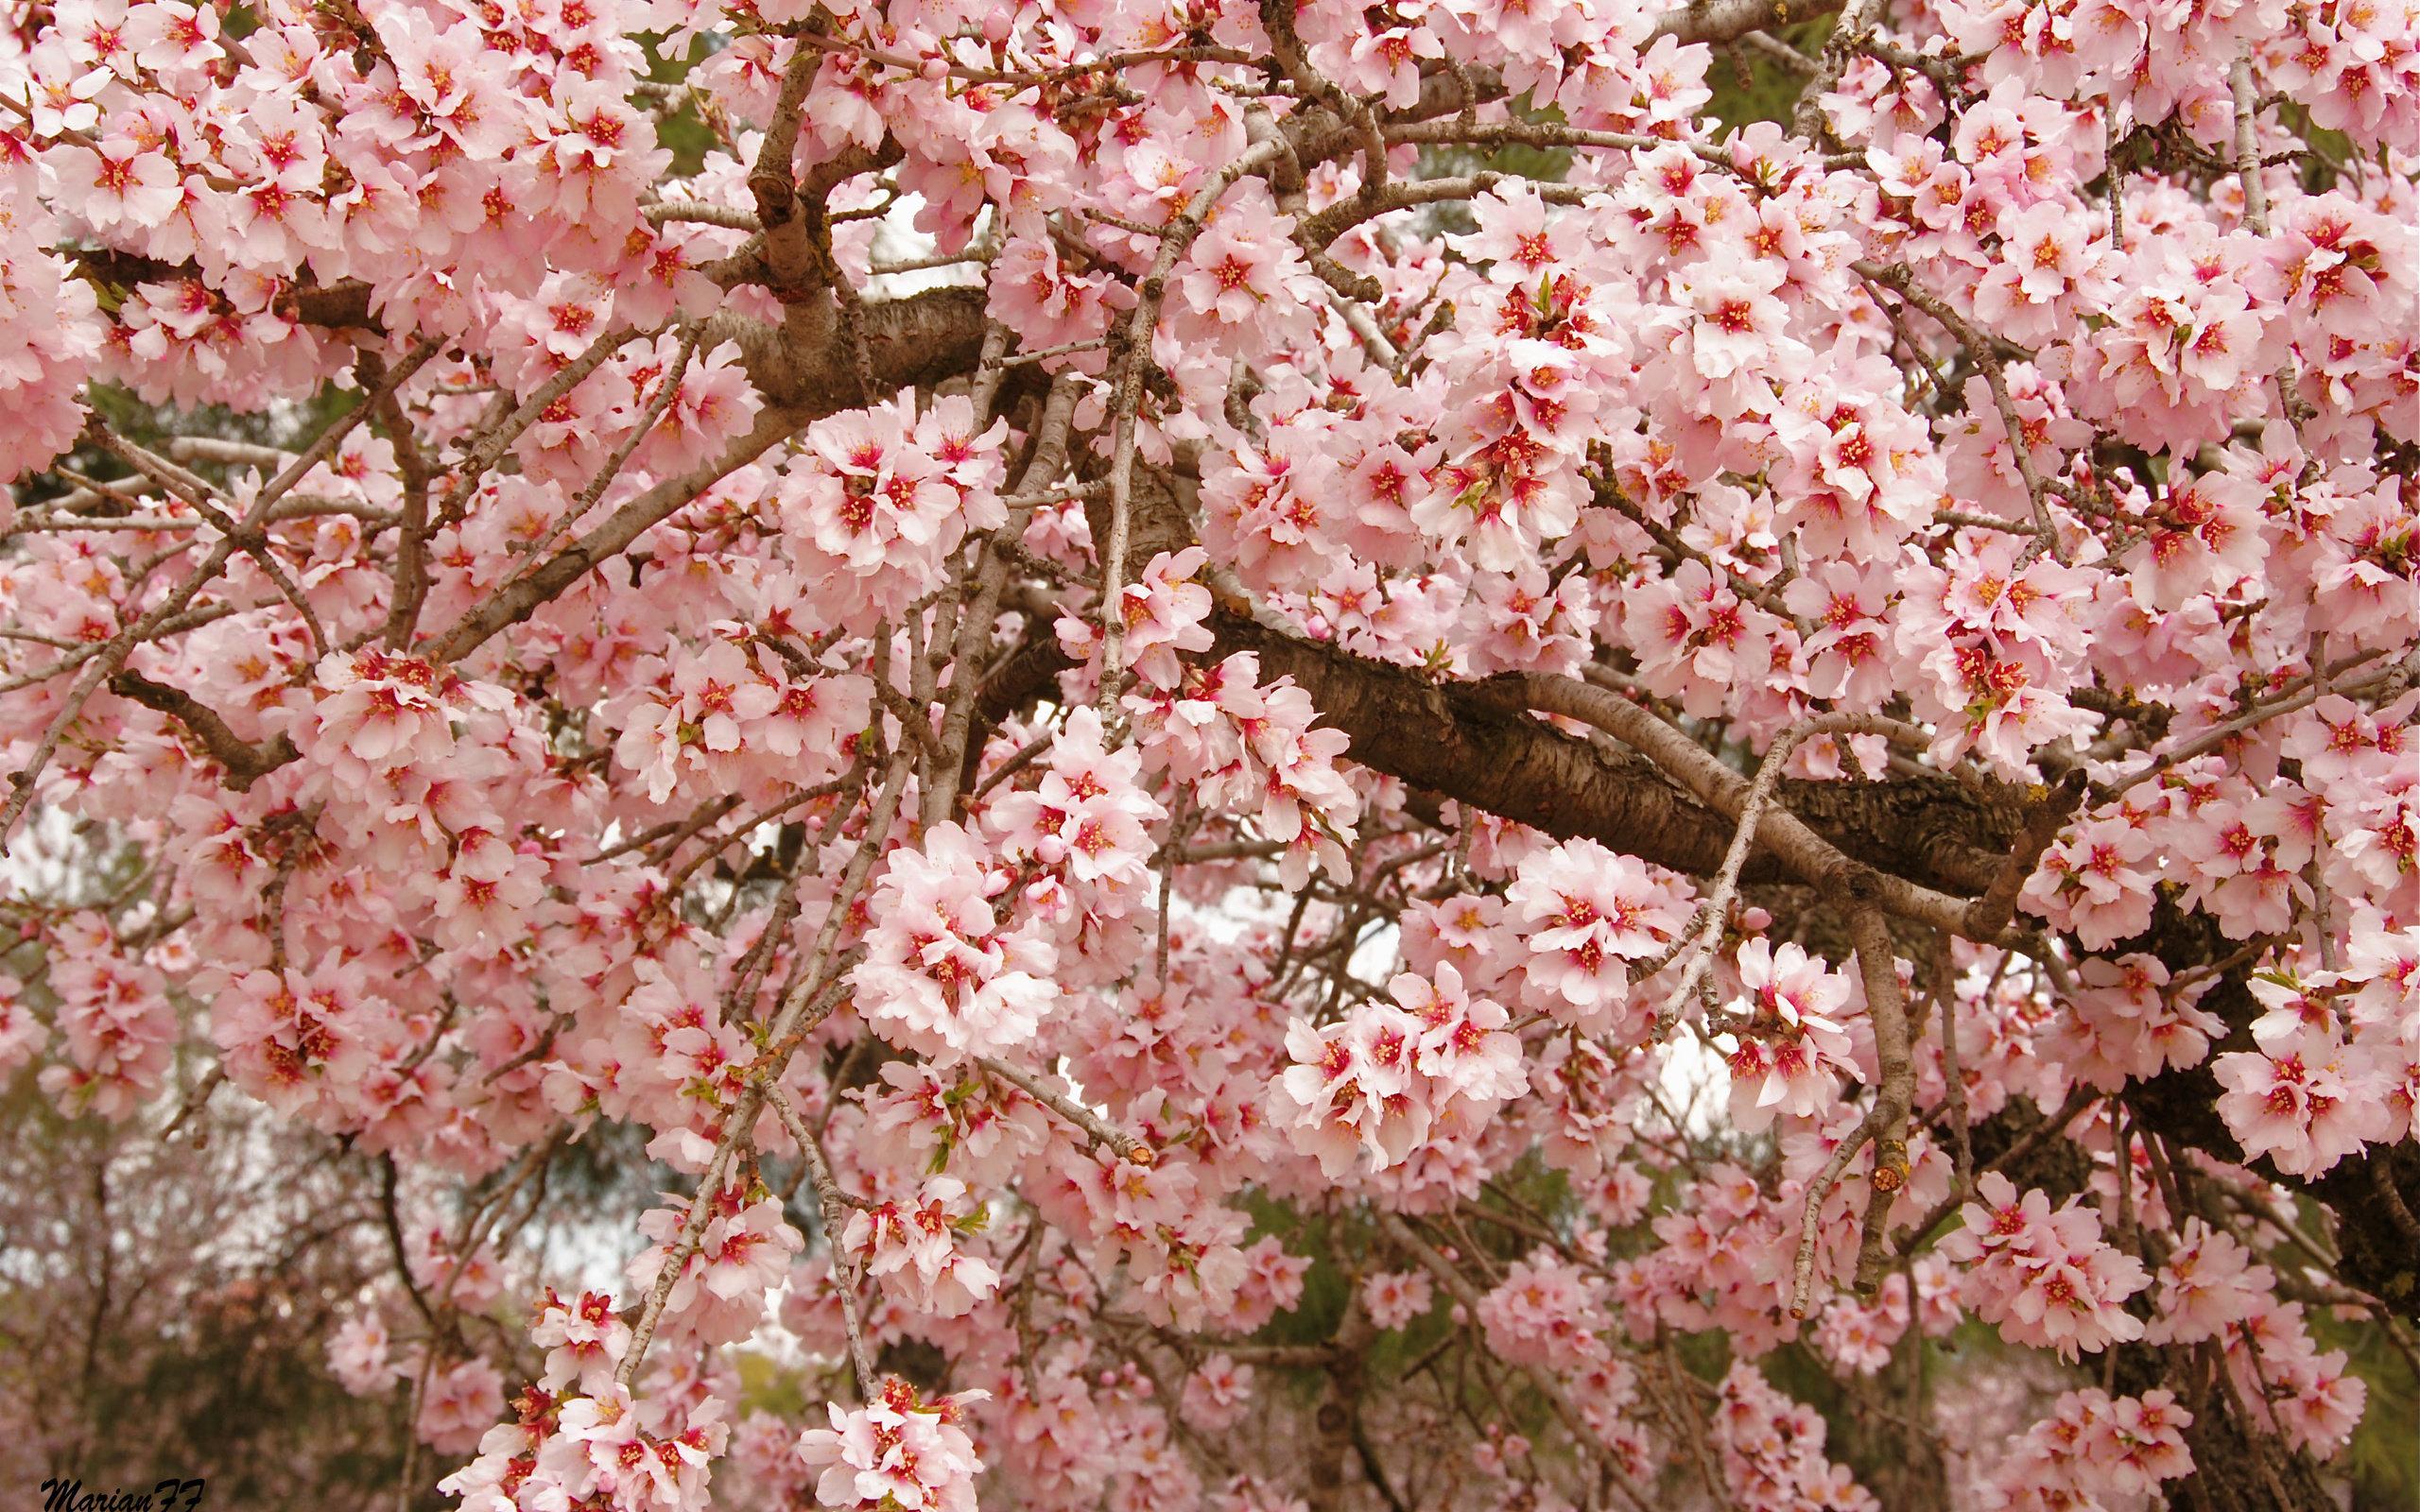 Free Sakura Tree Cherry Blossom High Quality Wallpaper ID250044 For Hd 2560x1600 Computer